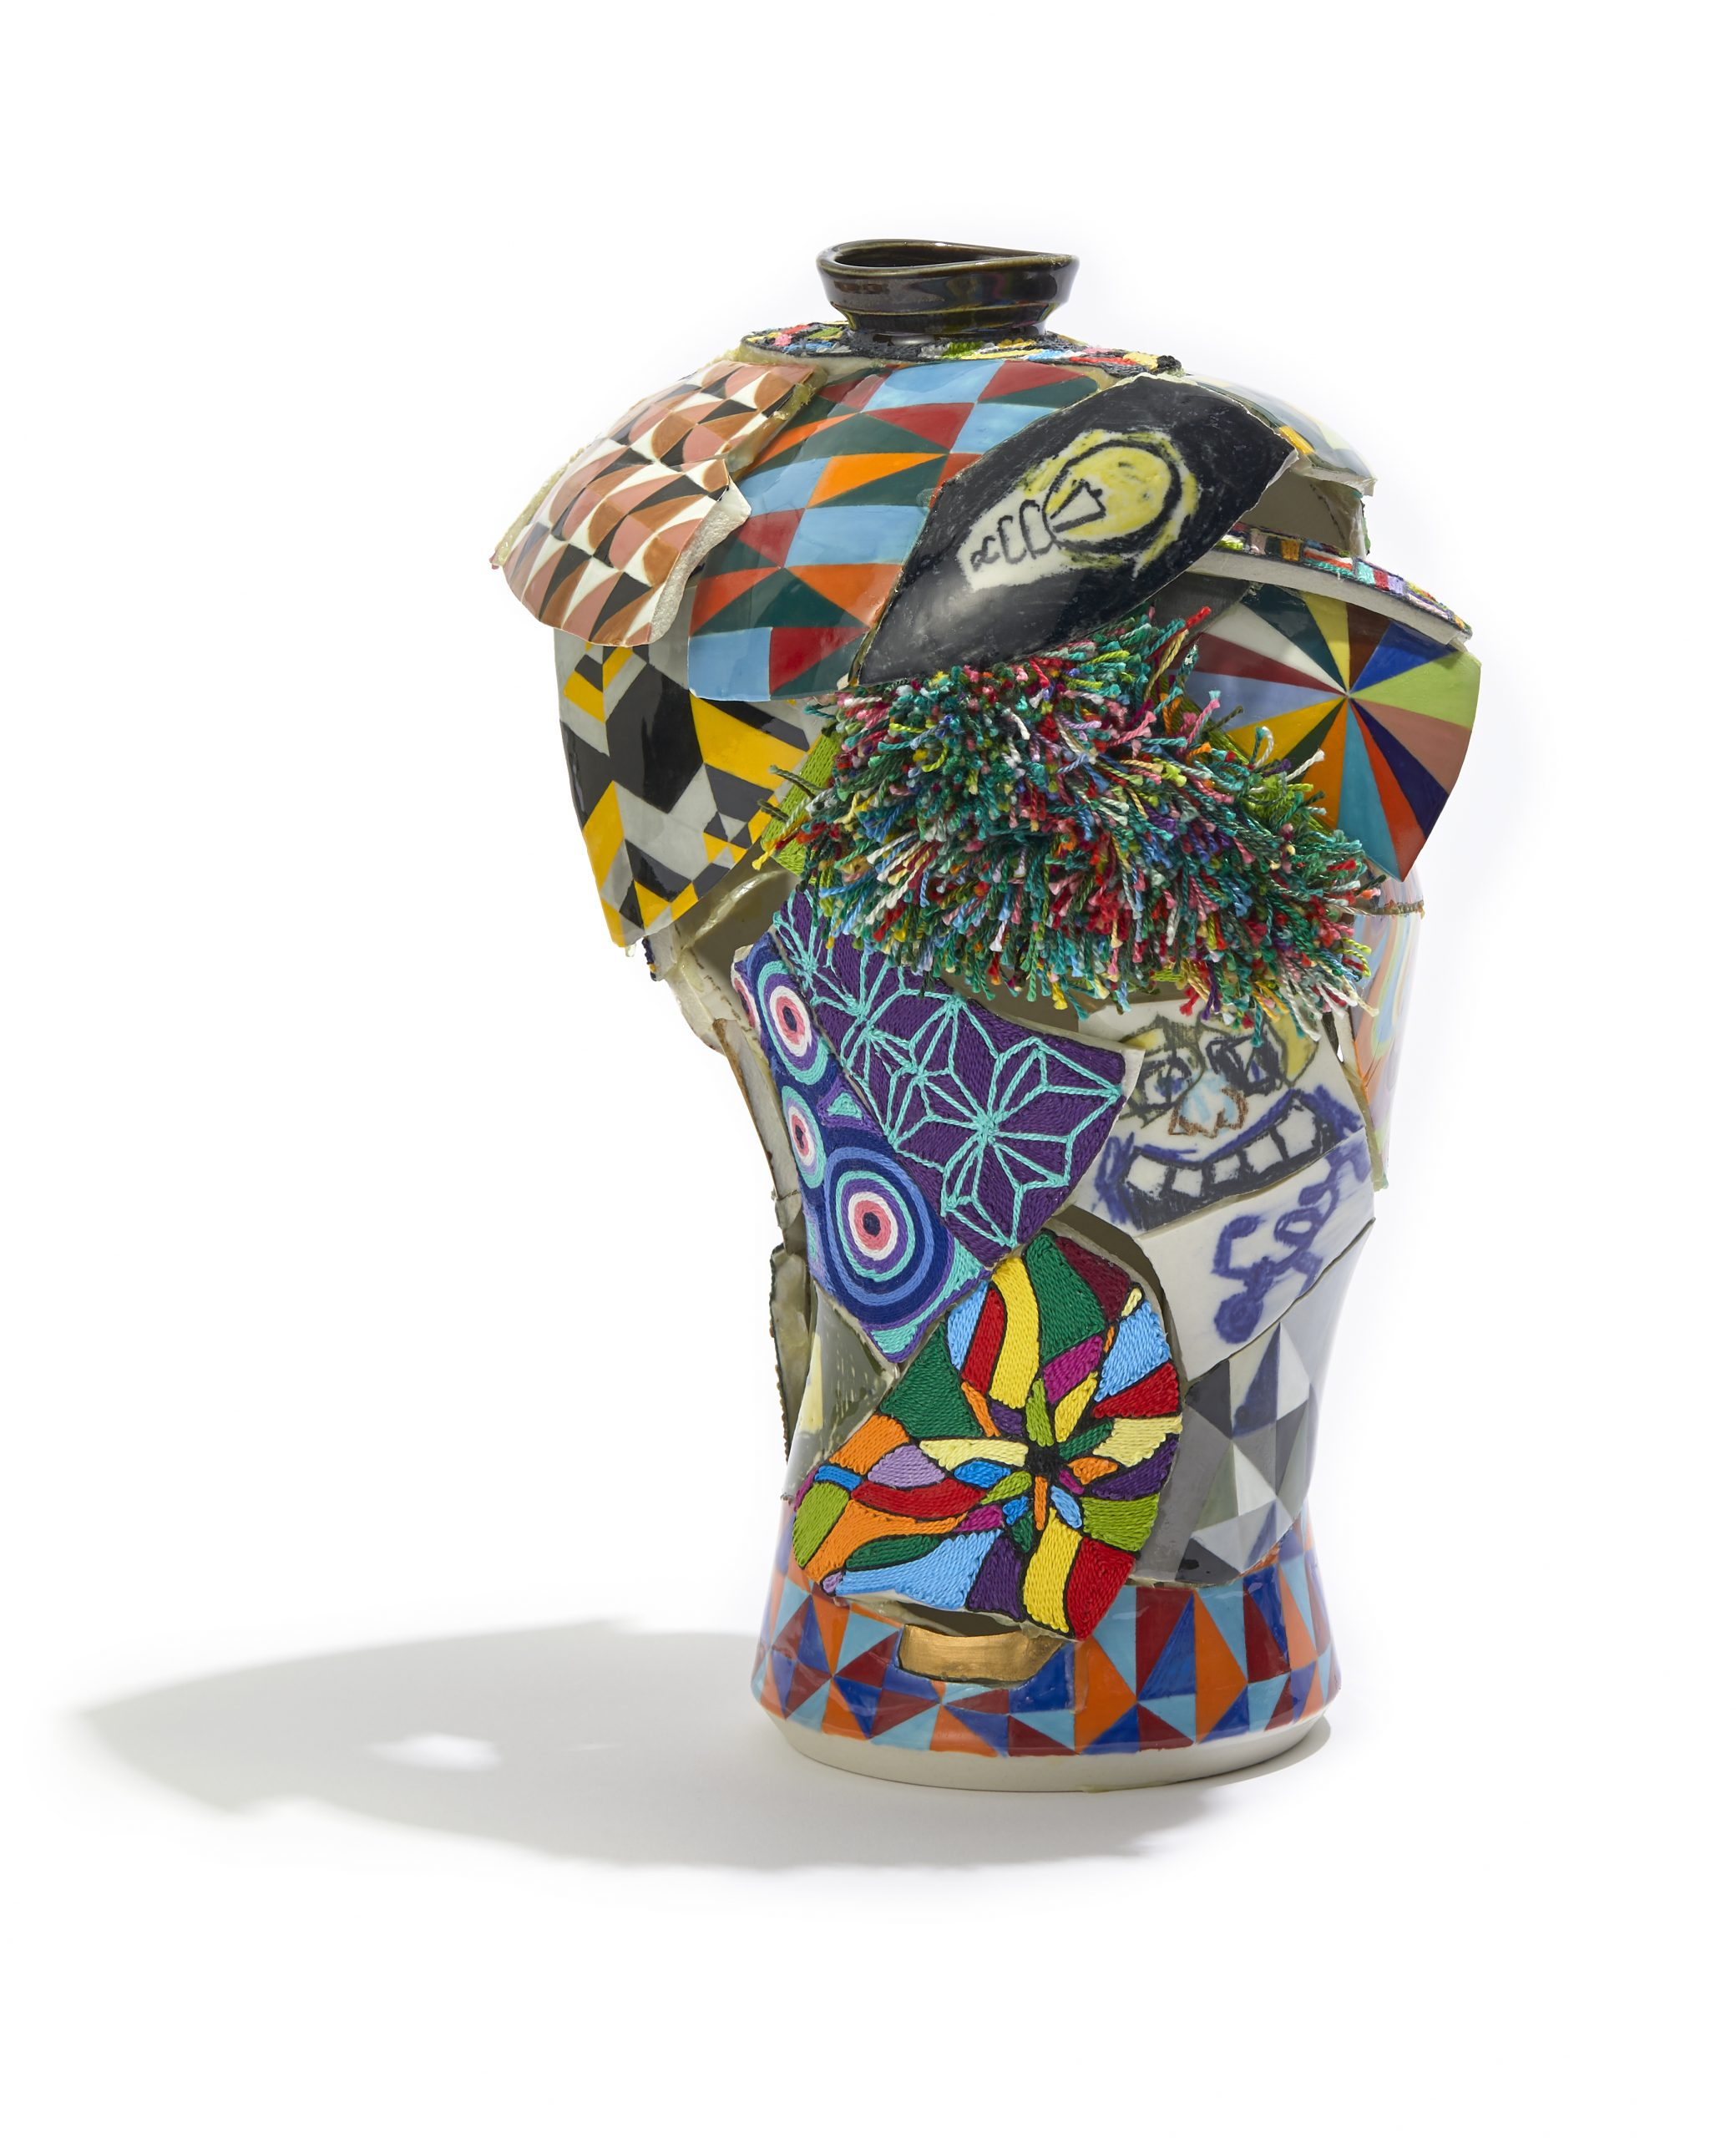 Artwork for the 2020 Biennial Members Exhibition at Fuller Craft Museum